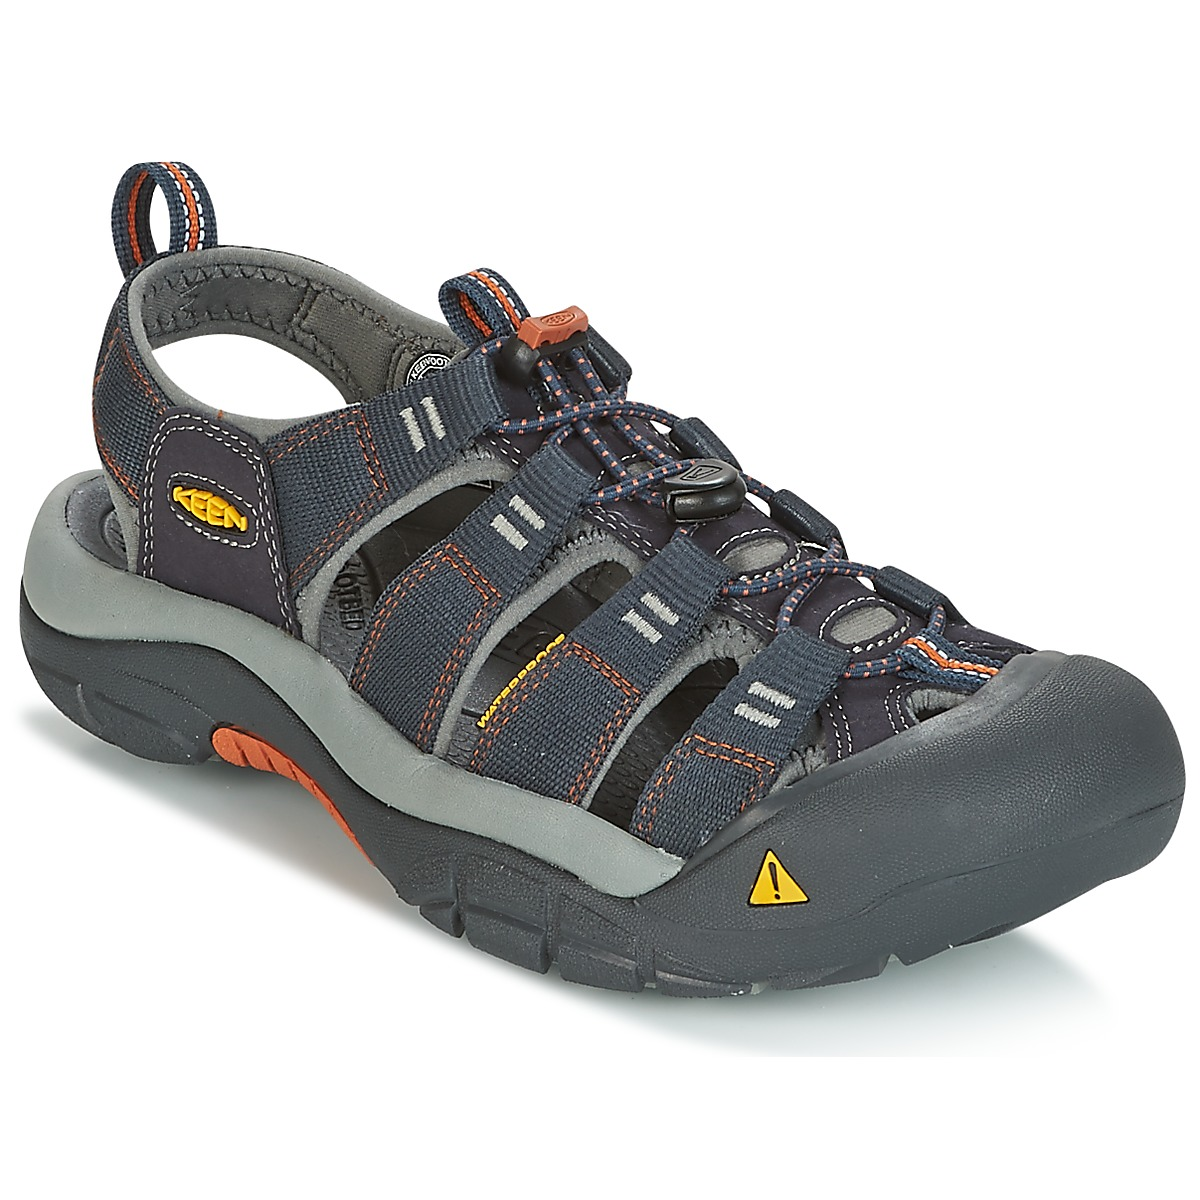 separation shoes d5fed 719b9 Keen Športni sandali NEWPORT H2 Siva